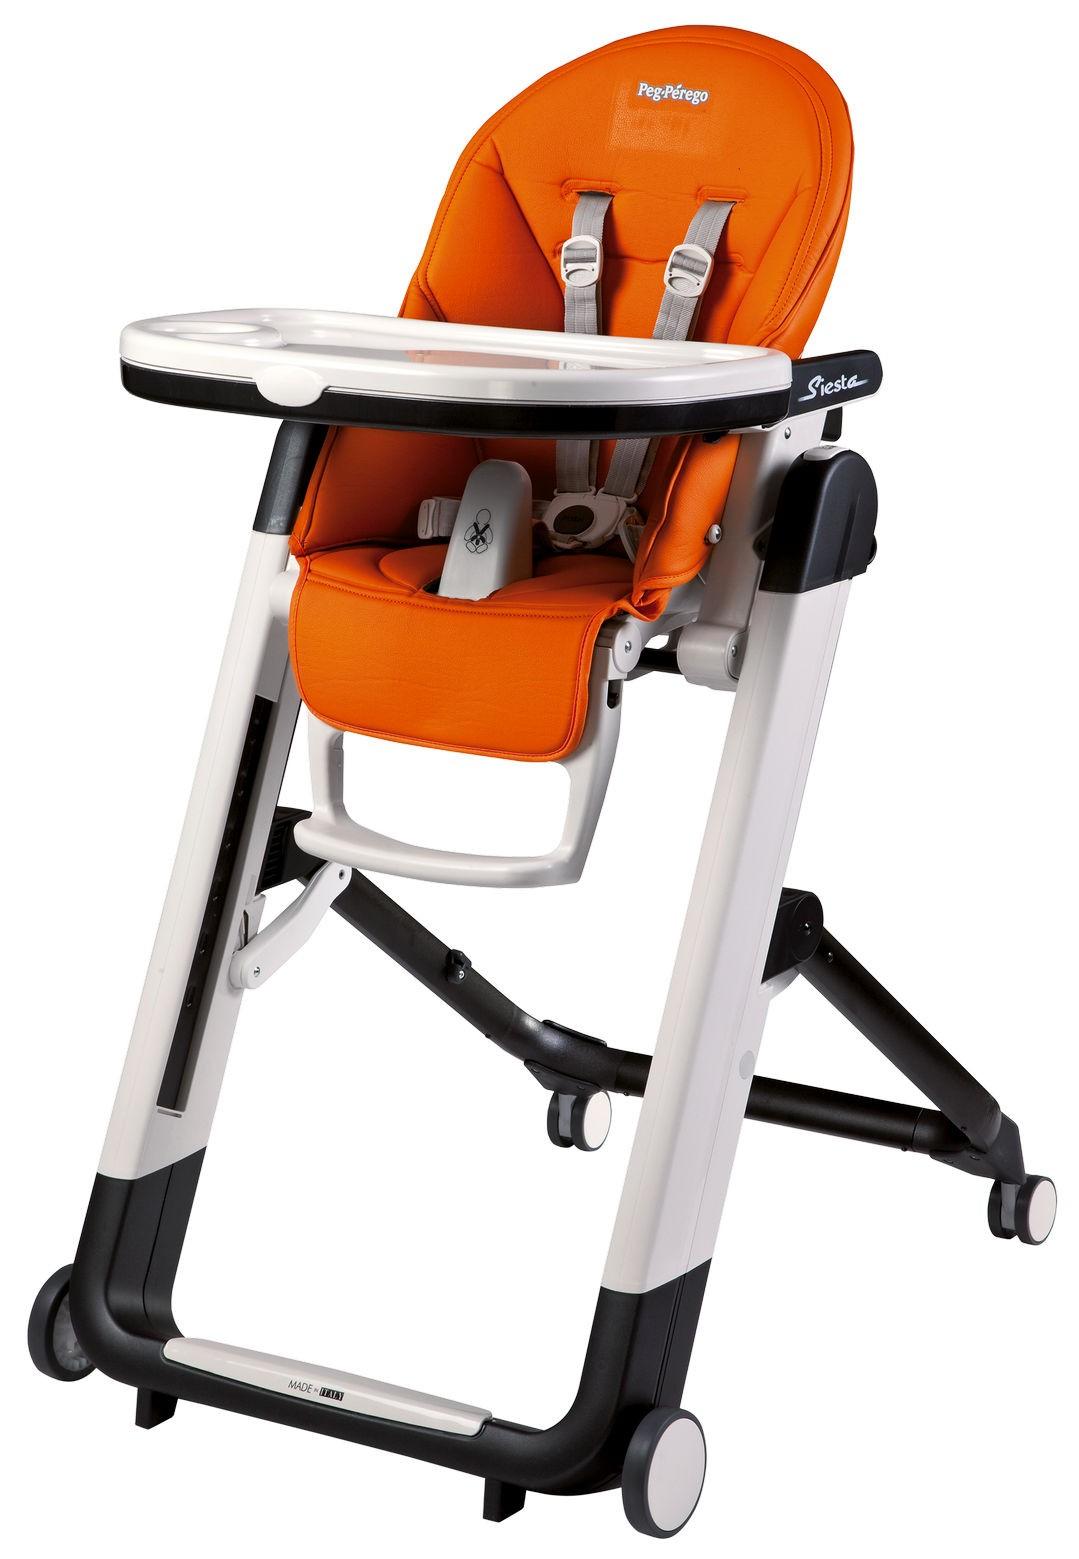 Peg Perego Chaise Haute Siesta Follow Me Orange